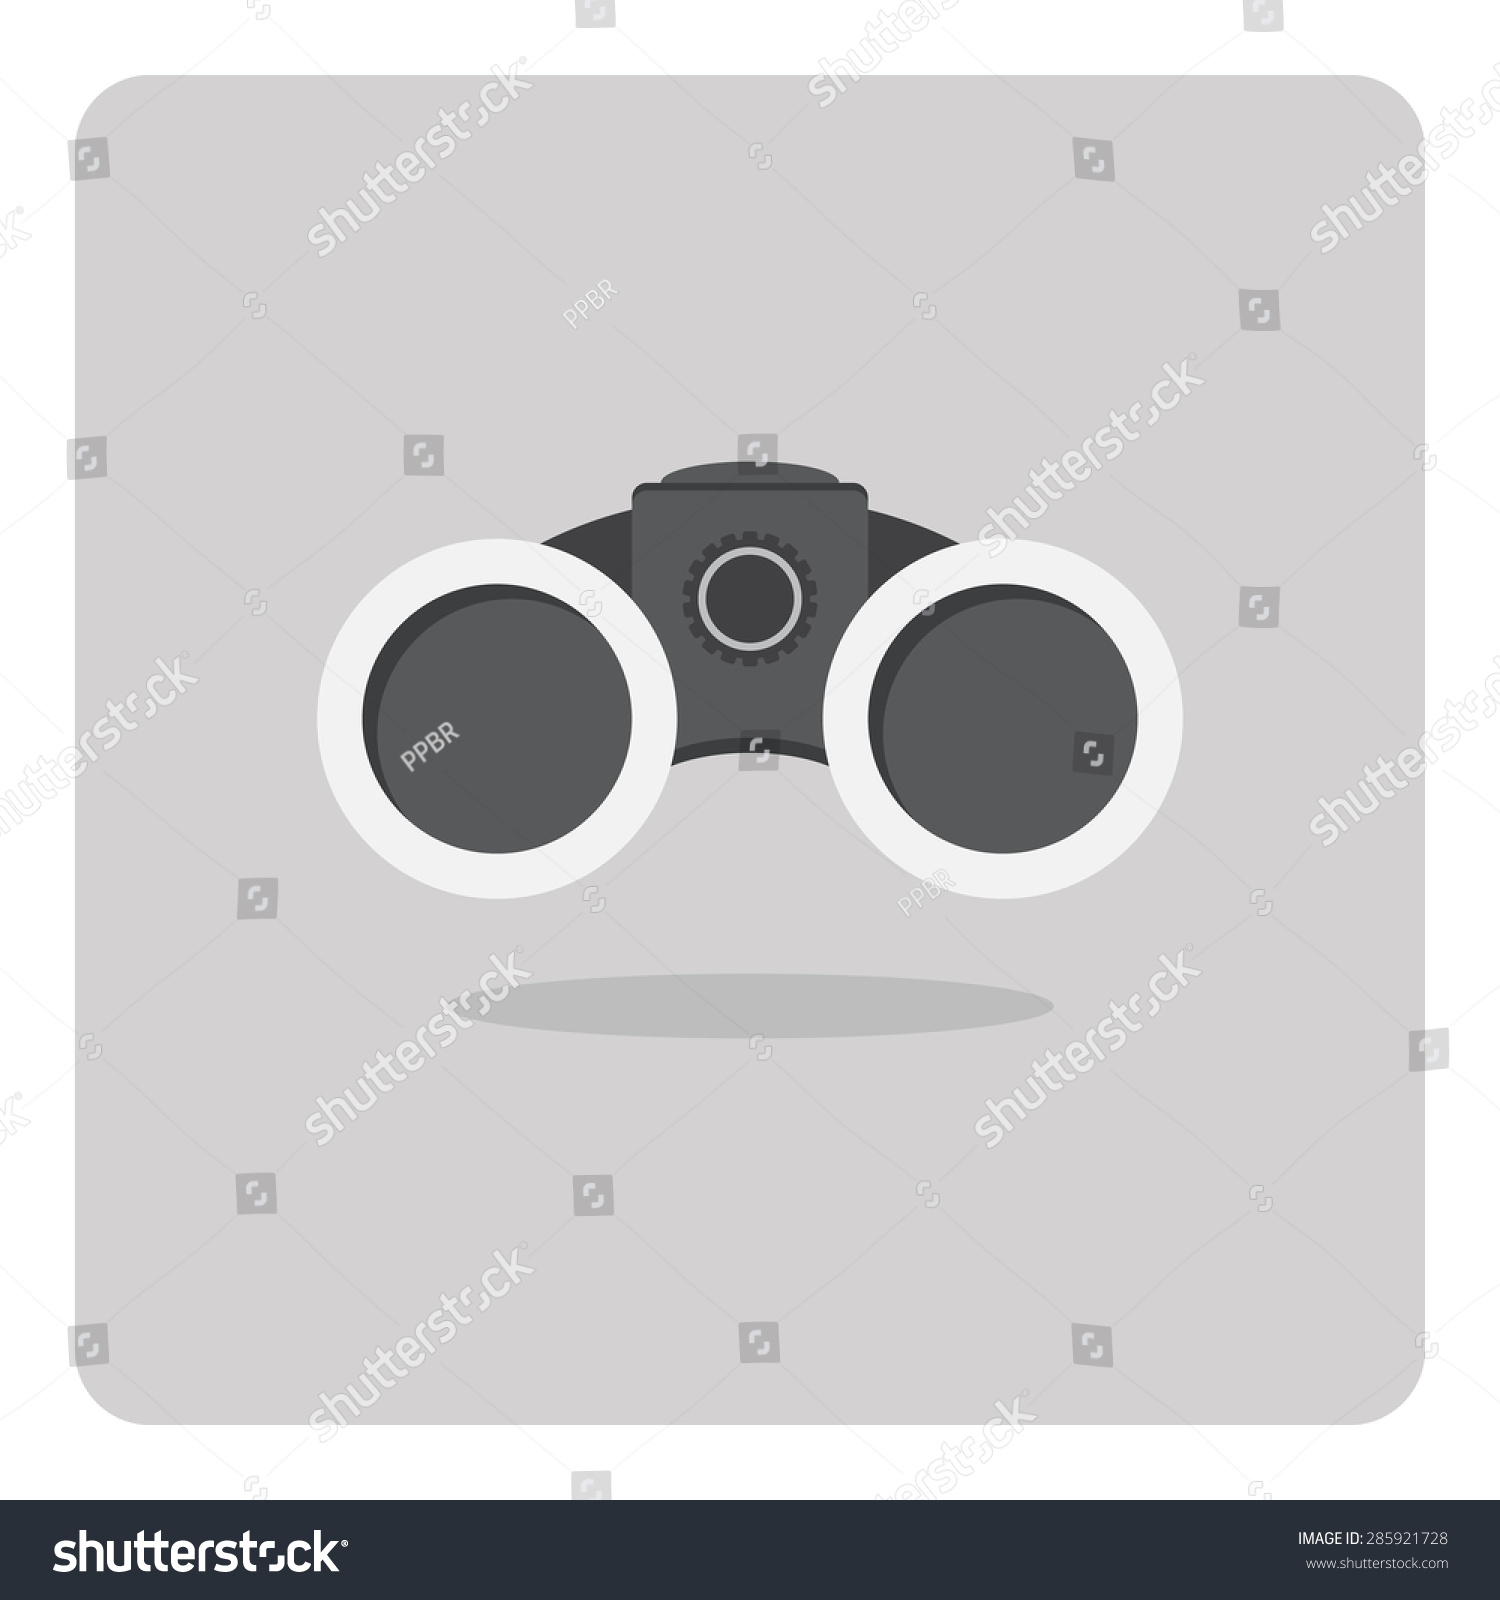 binoculars icon flat - photo #34